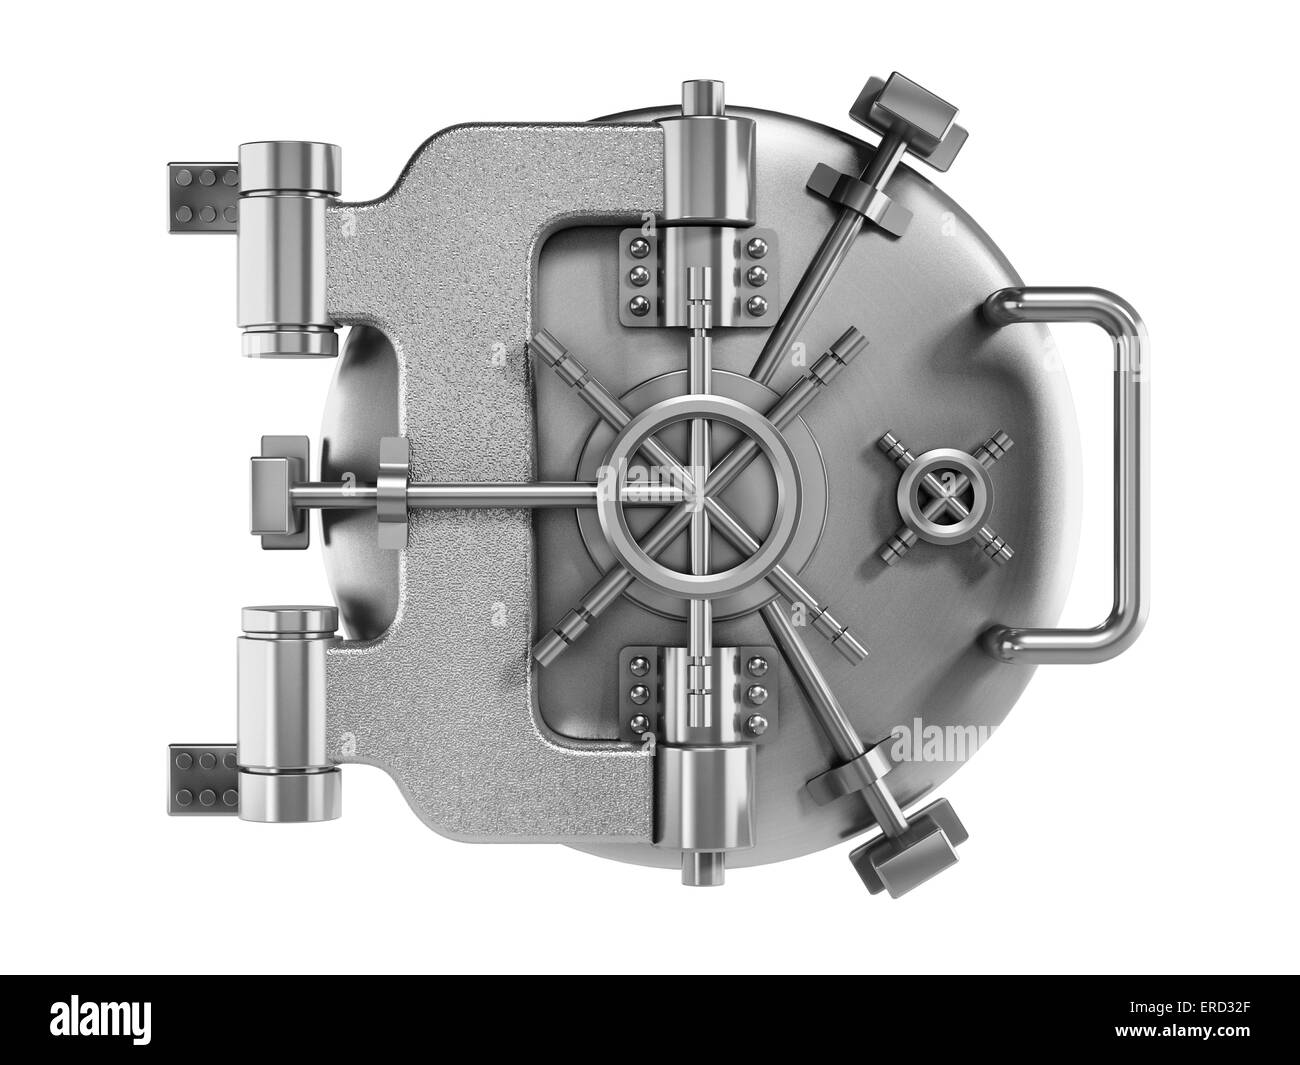 Vaulted metal bank door isolated on white - Stock Image